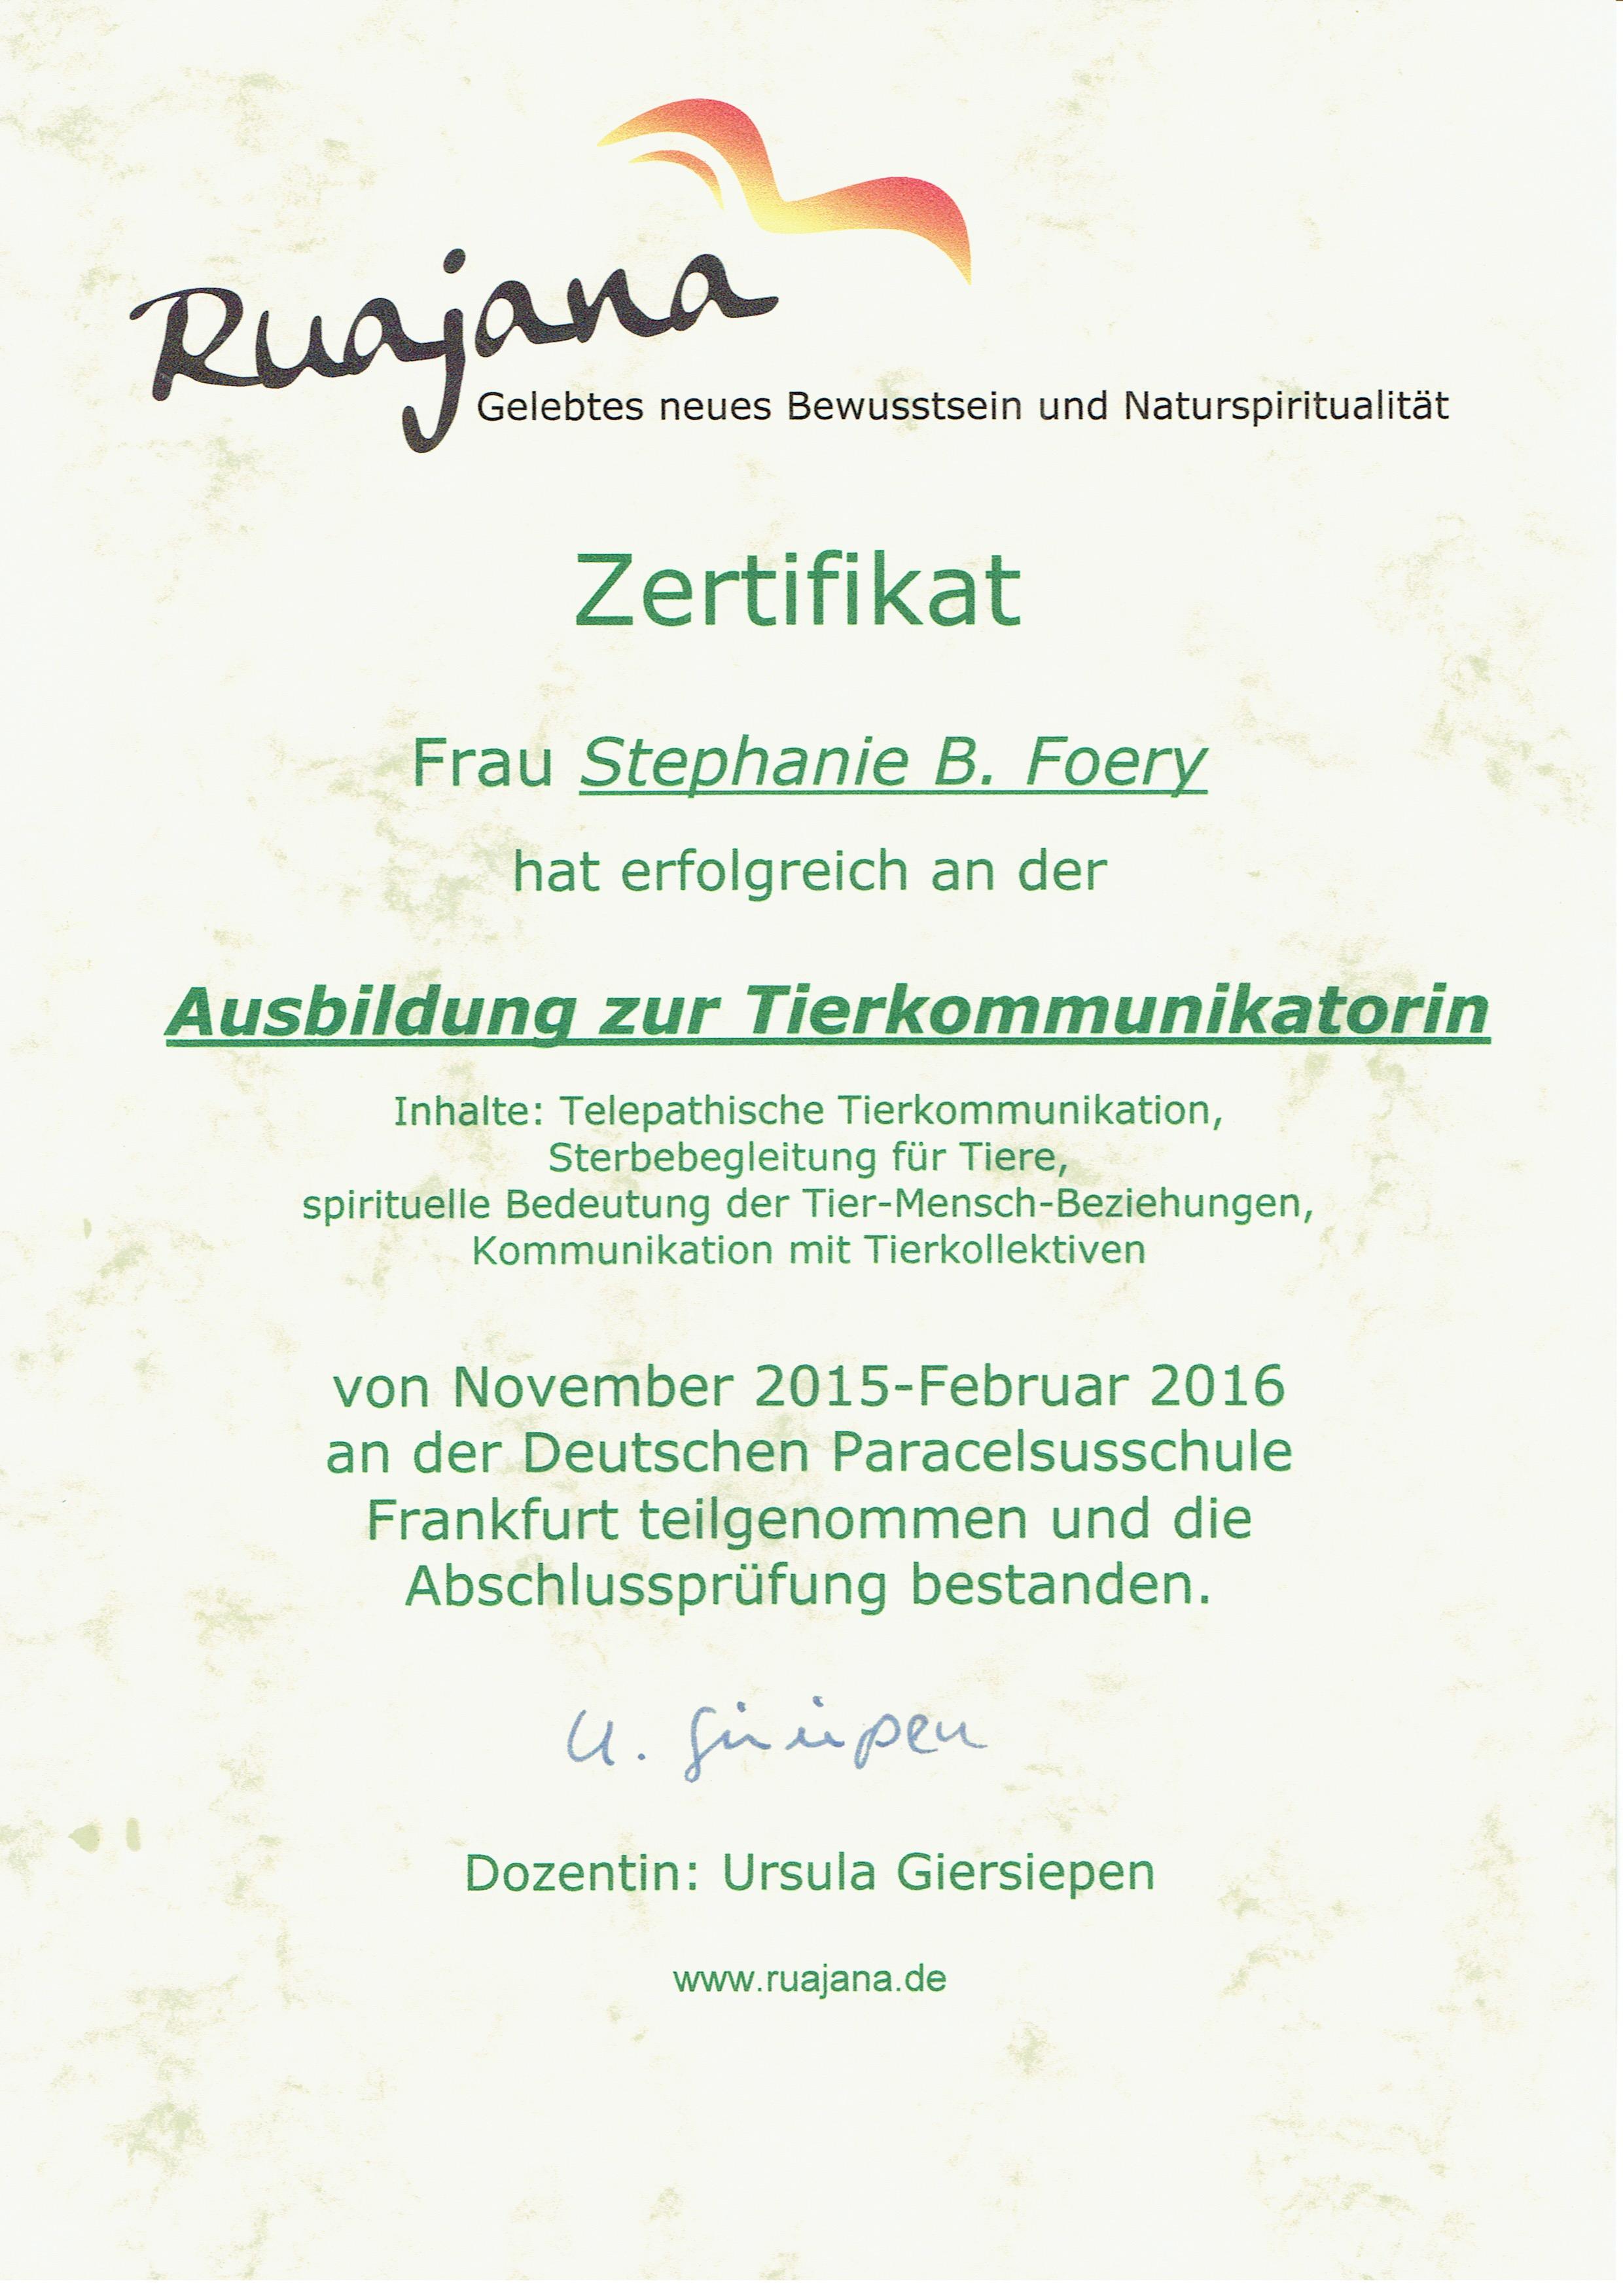 TK Zertifikat Giersiepenn